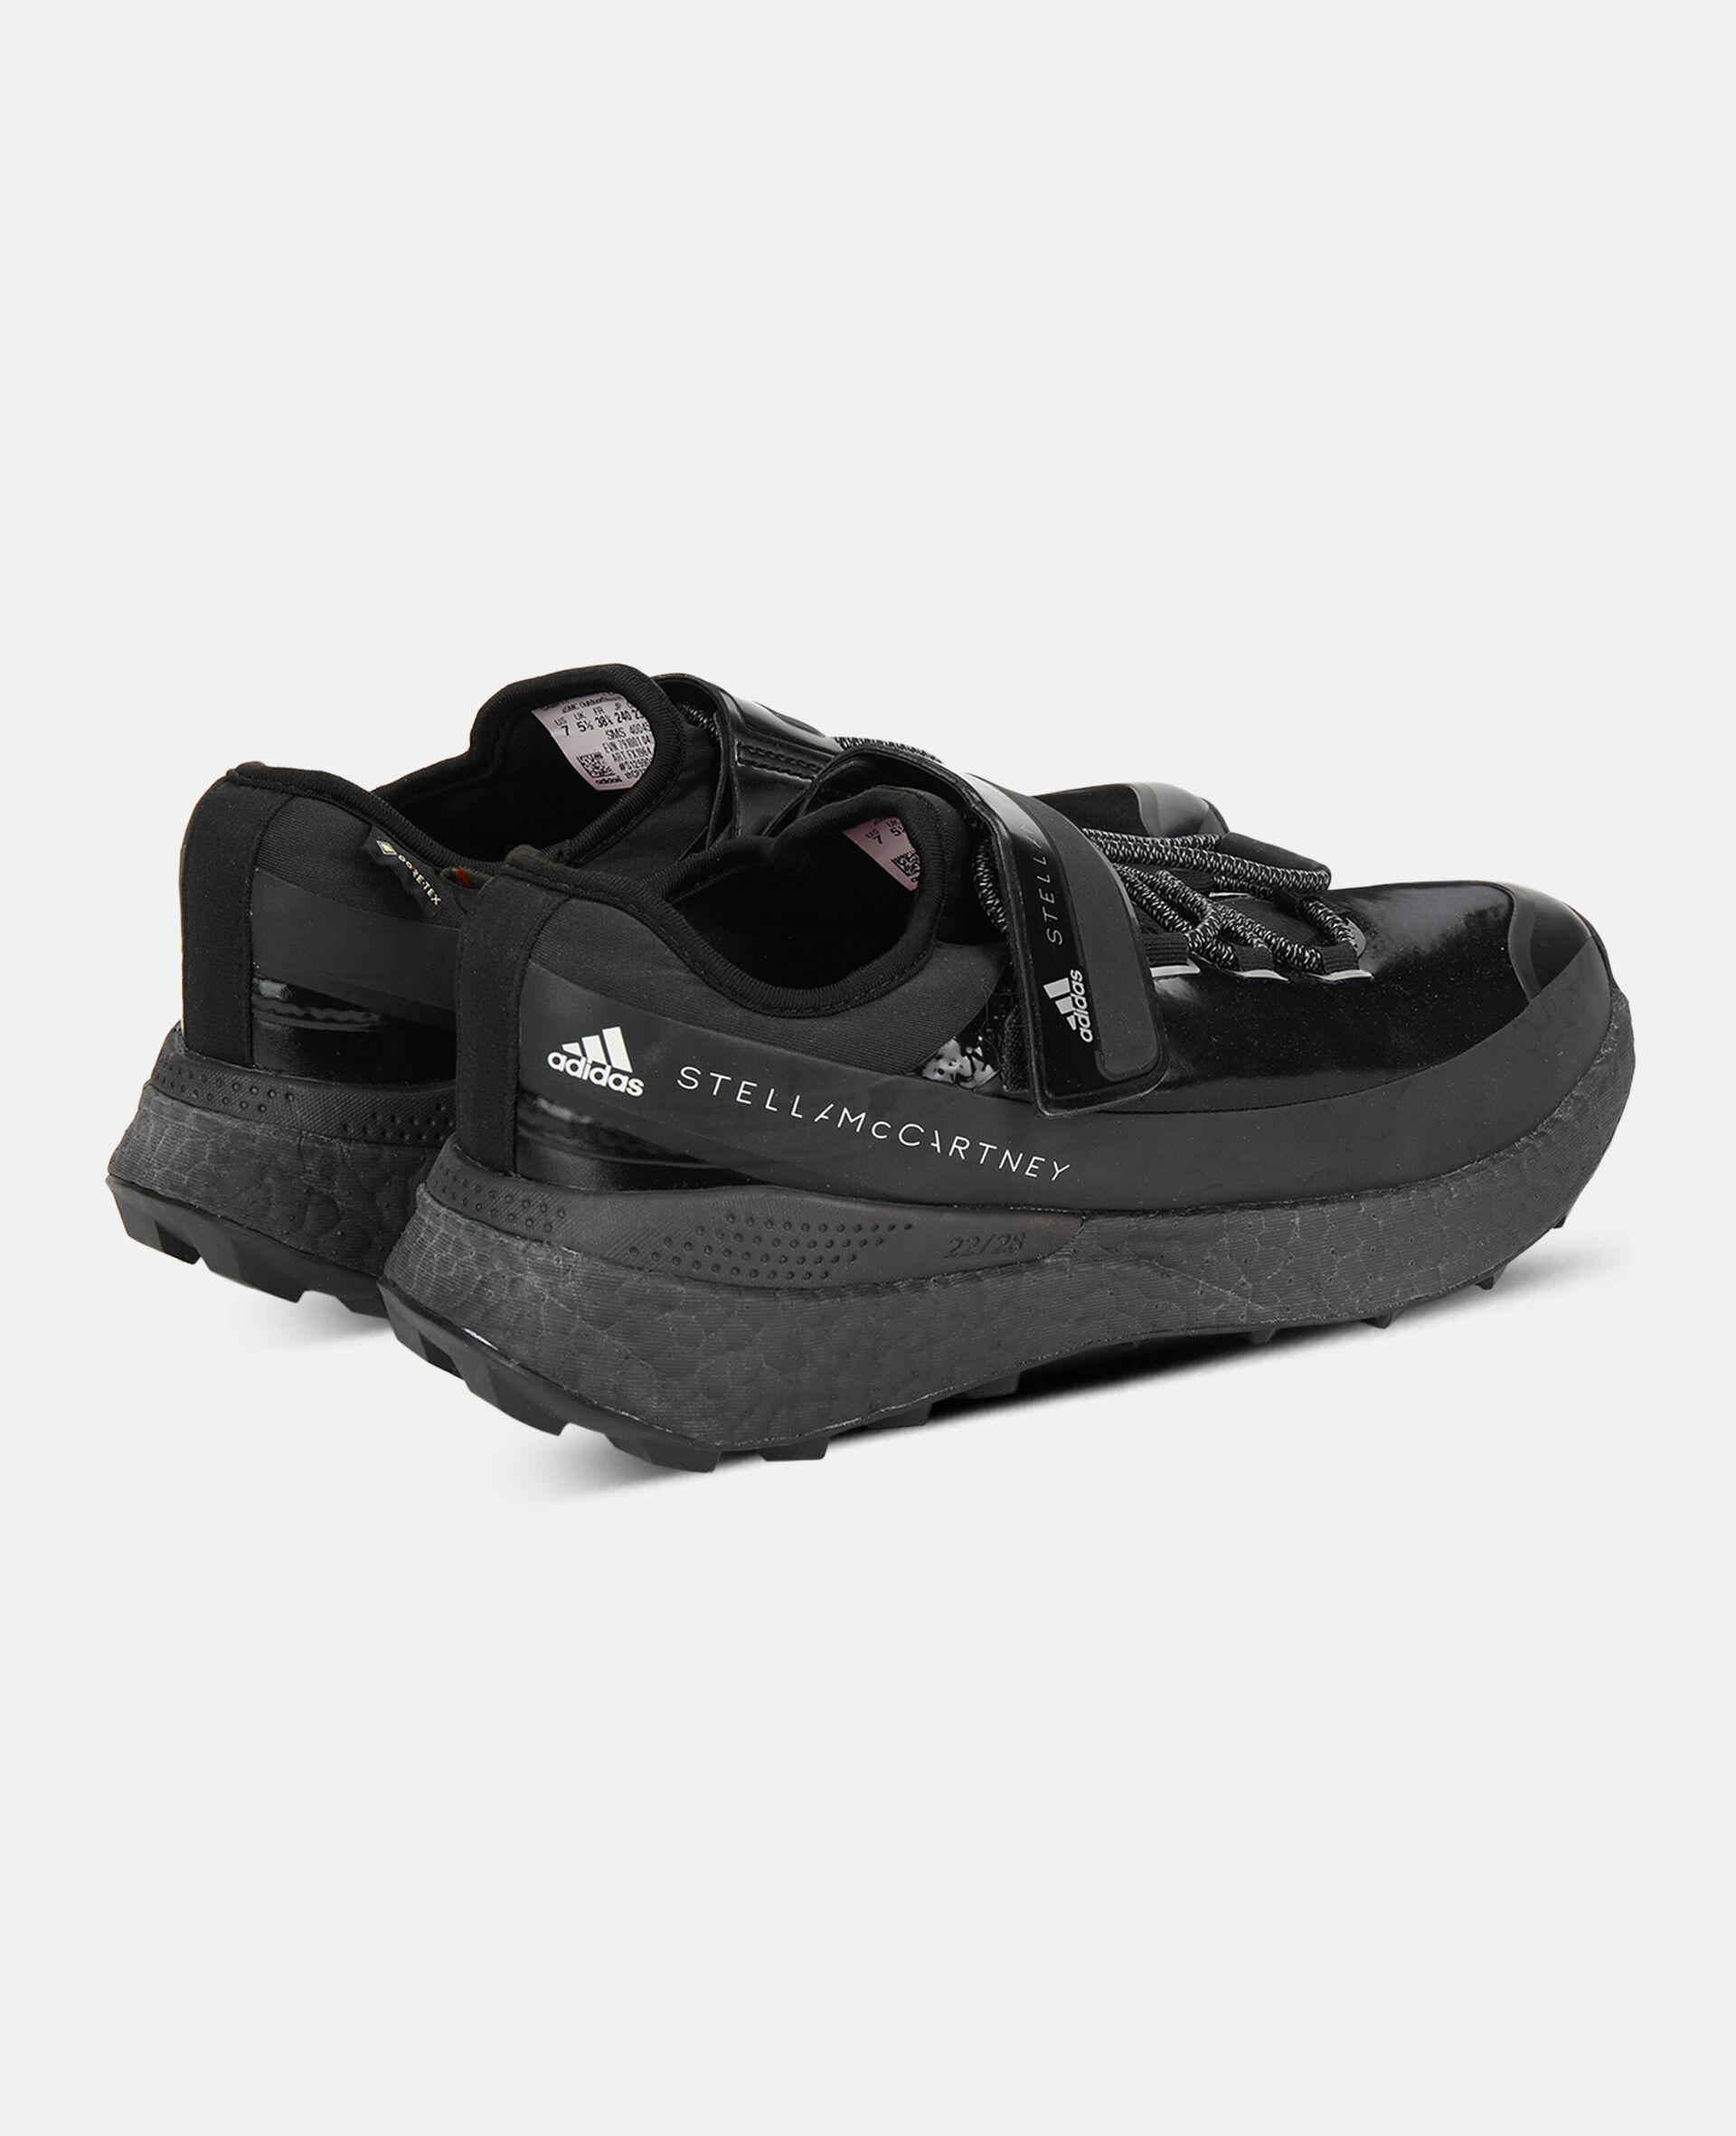 Chaussures de running Outdoor Boost rain.rdy noires -Noir-large image number 4